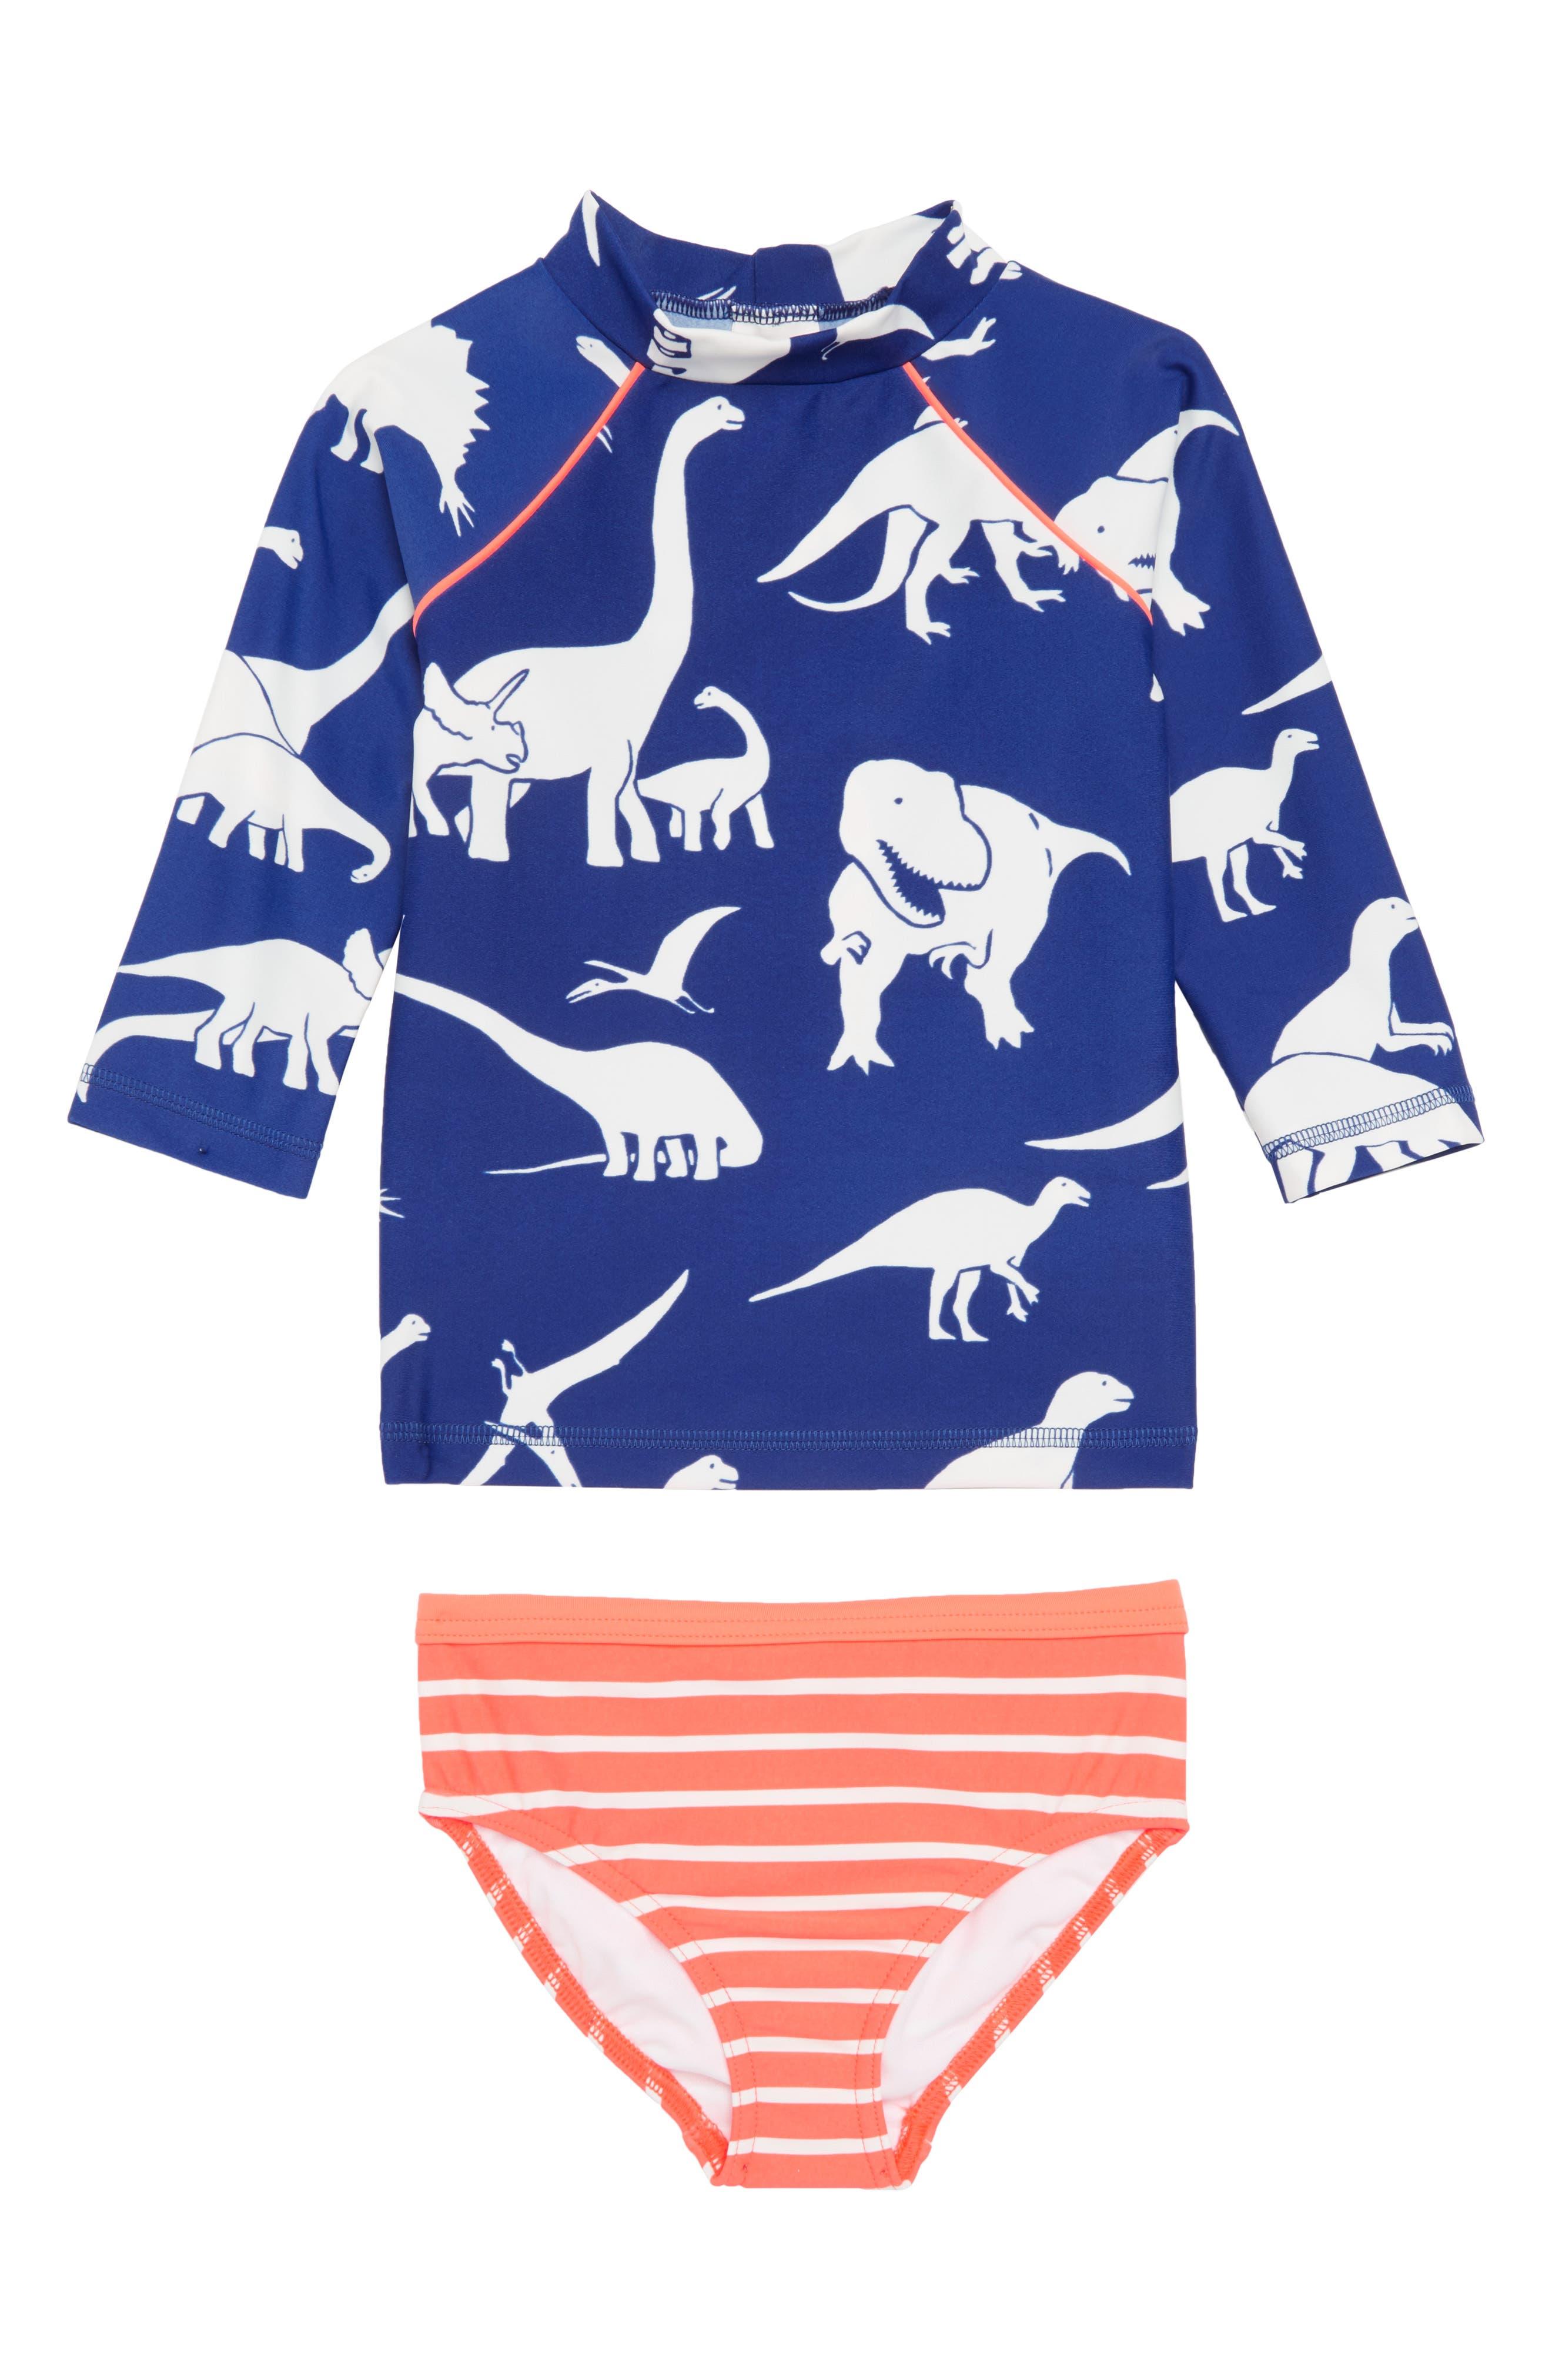 Main Image - Mini Boden Print Surf Set Two-Piece Rashguard Swimsuit (Toddler Girls, Little Girls & Big Girls)